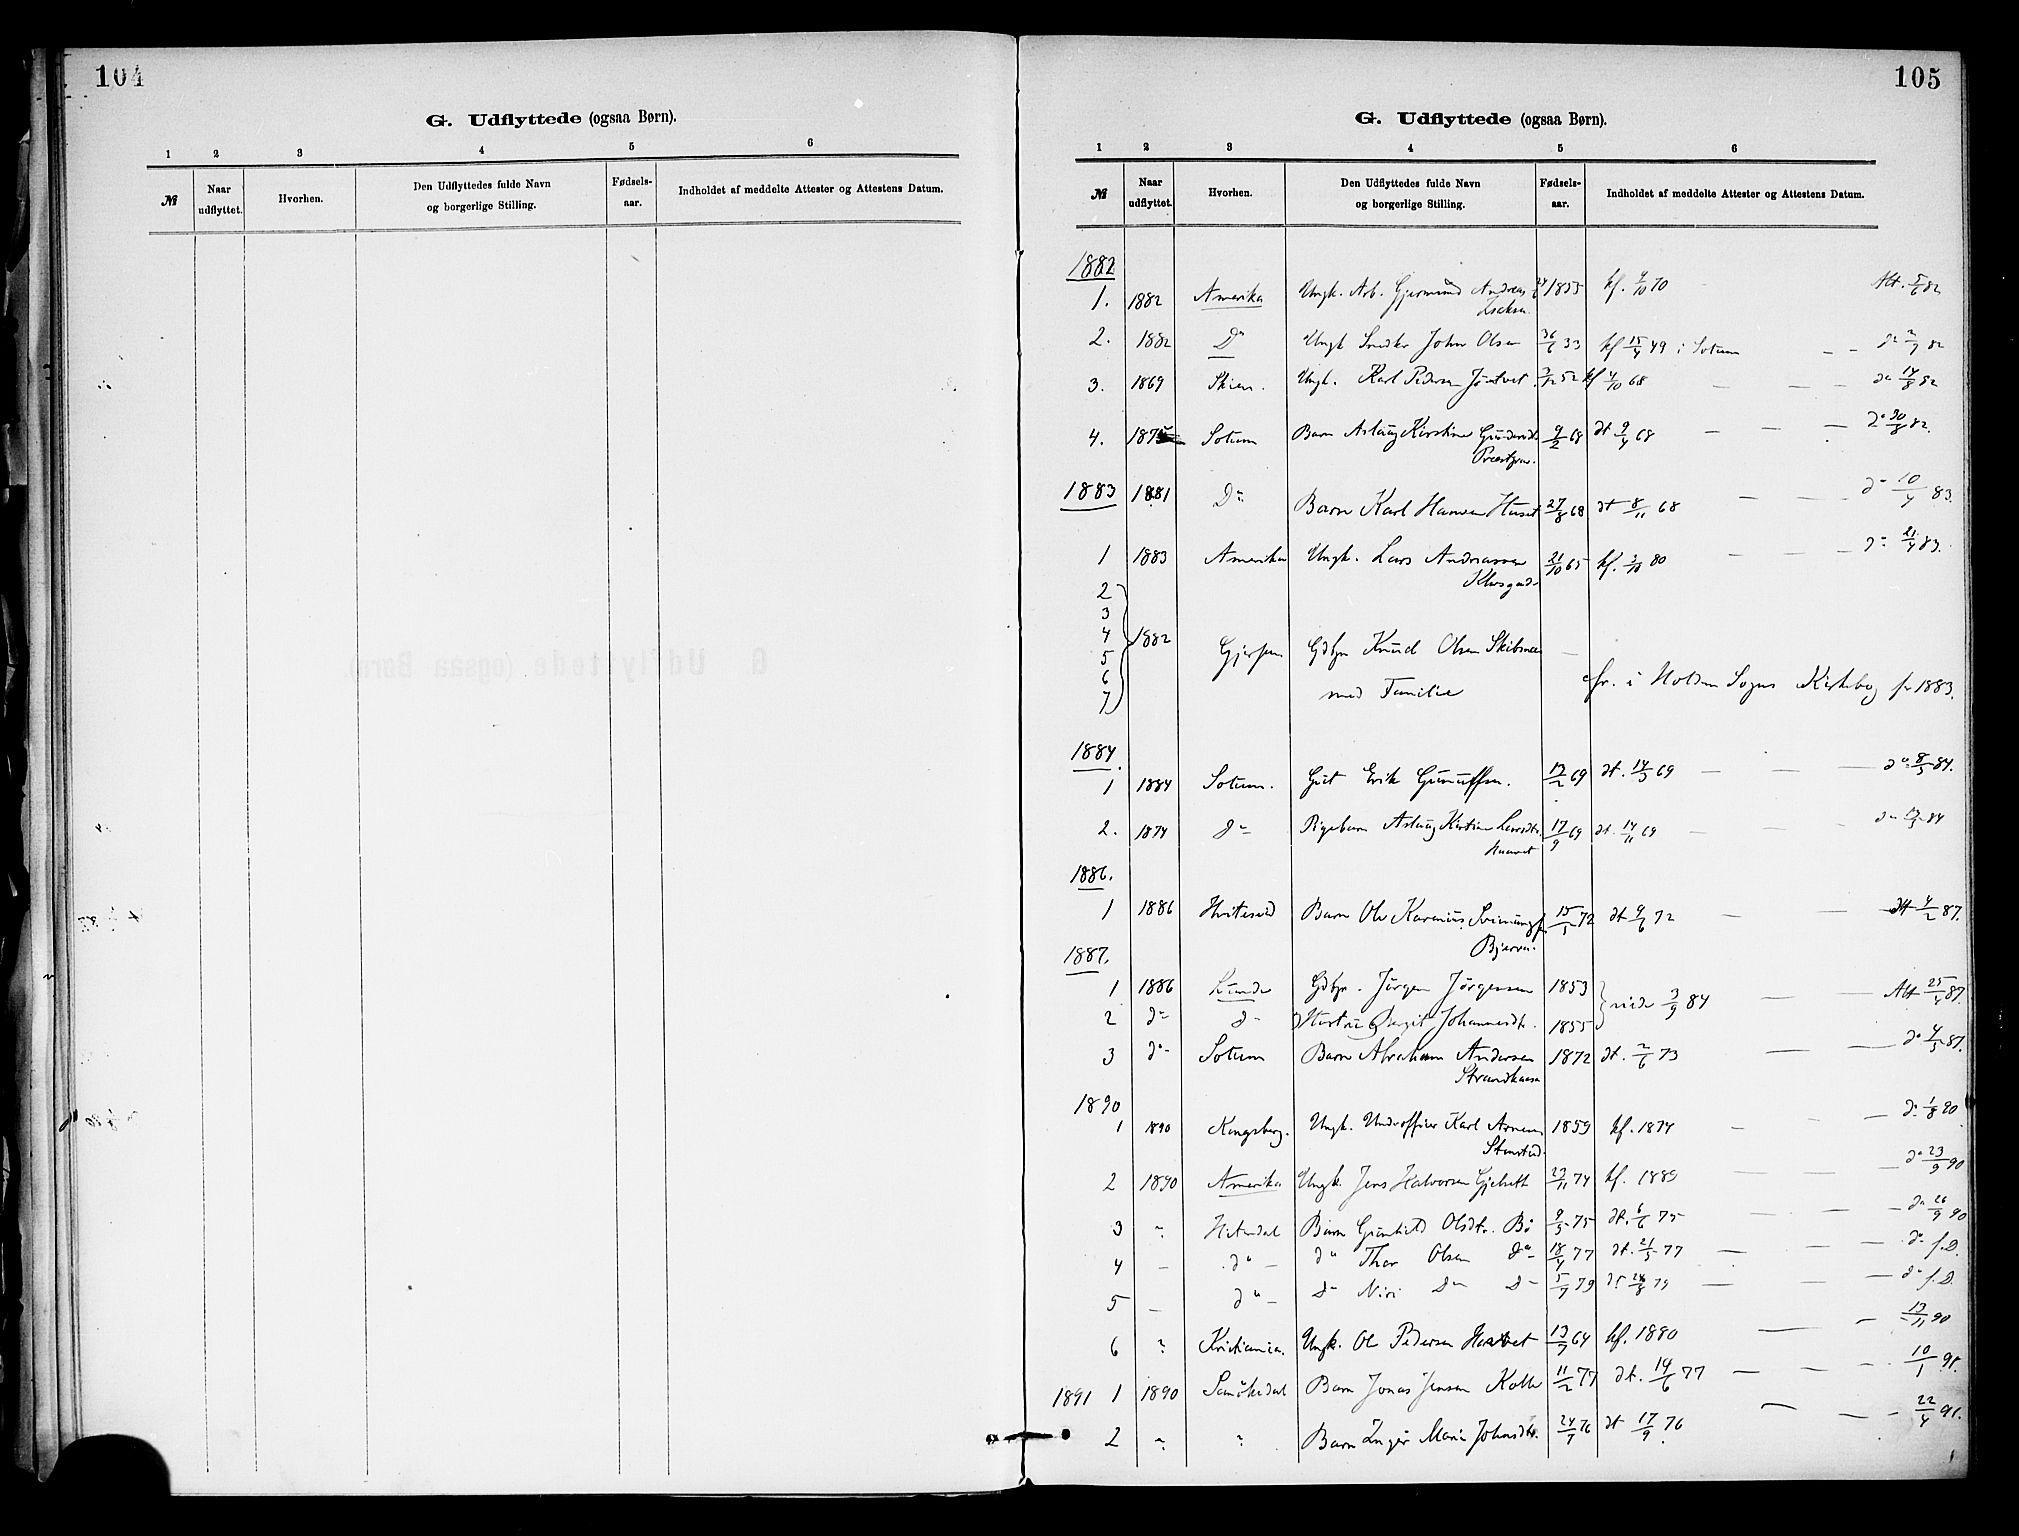 SAKO, Holla kirkebøker, F/Fa/L0009: Ministerialbok nr. 9, 1881-1897, s. 105